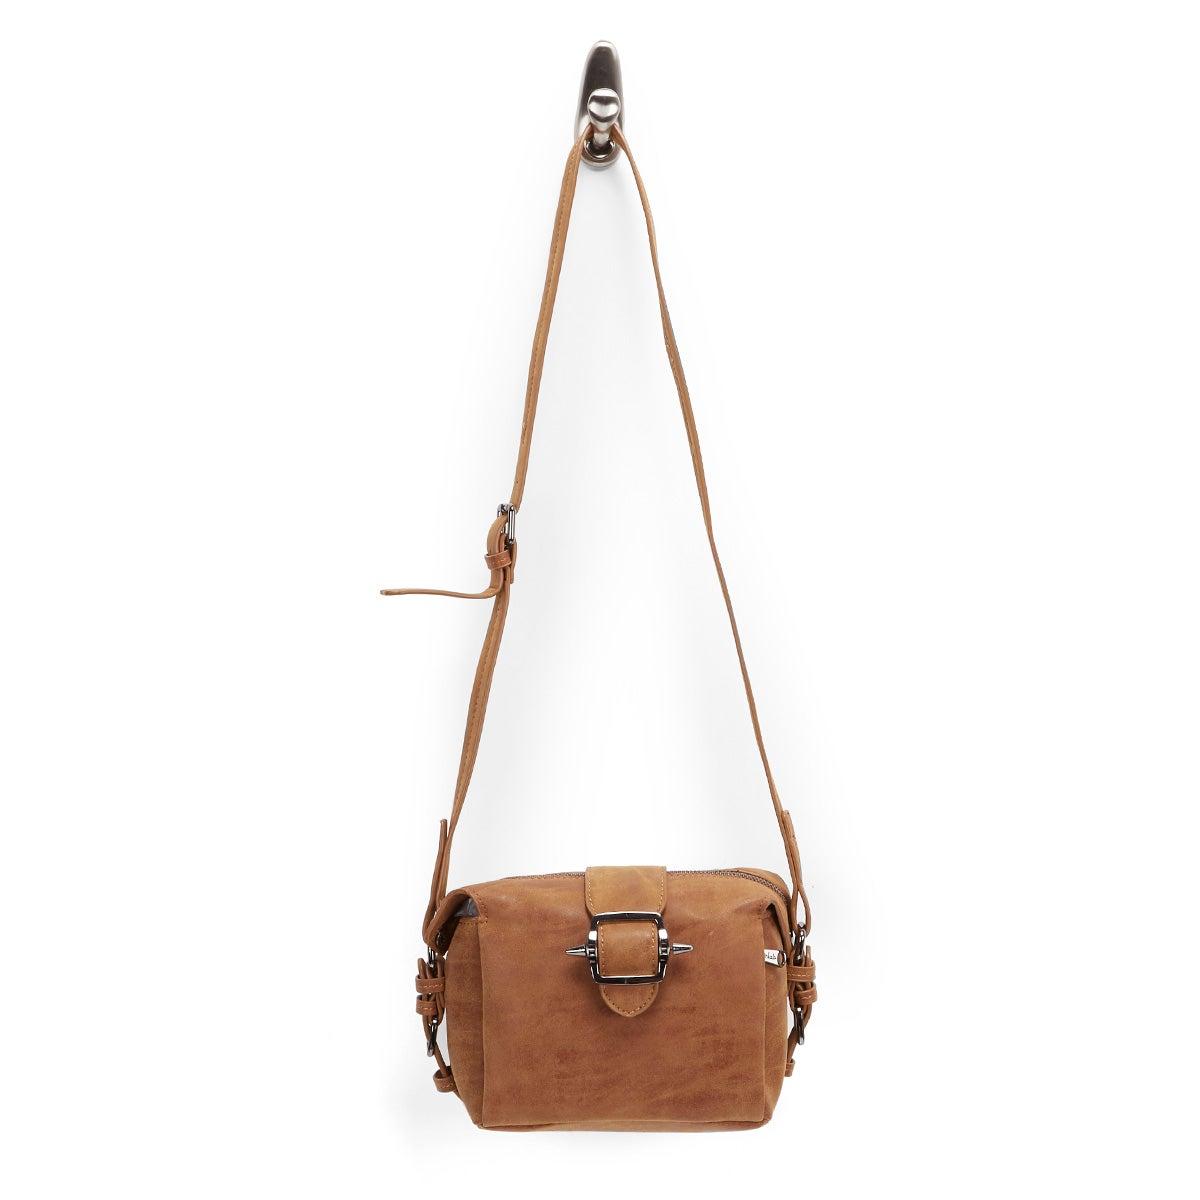 Lds camel buckle cross body bag